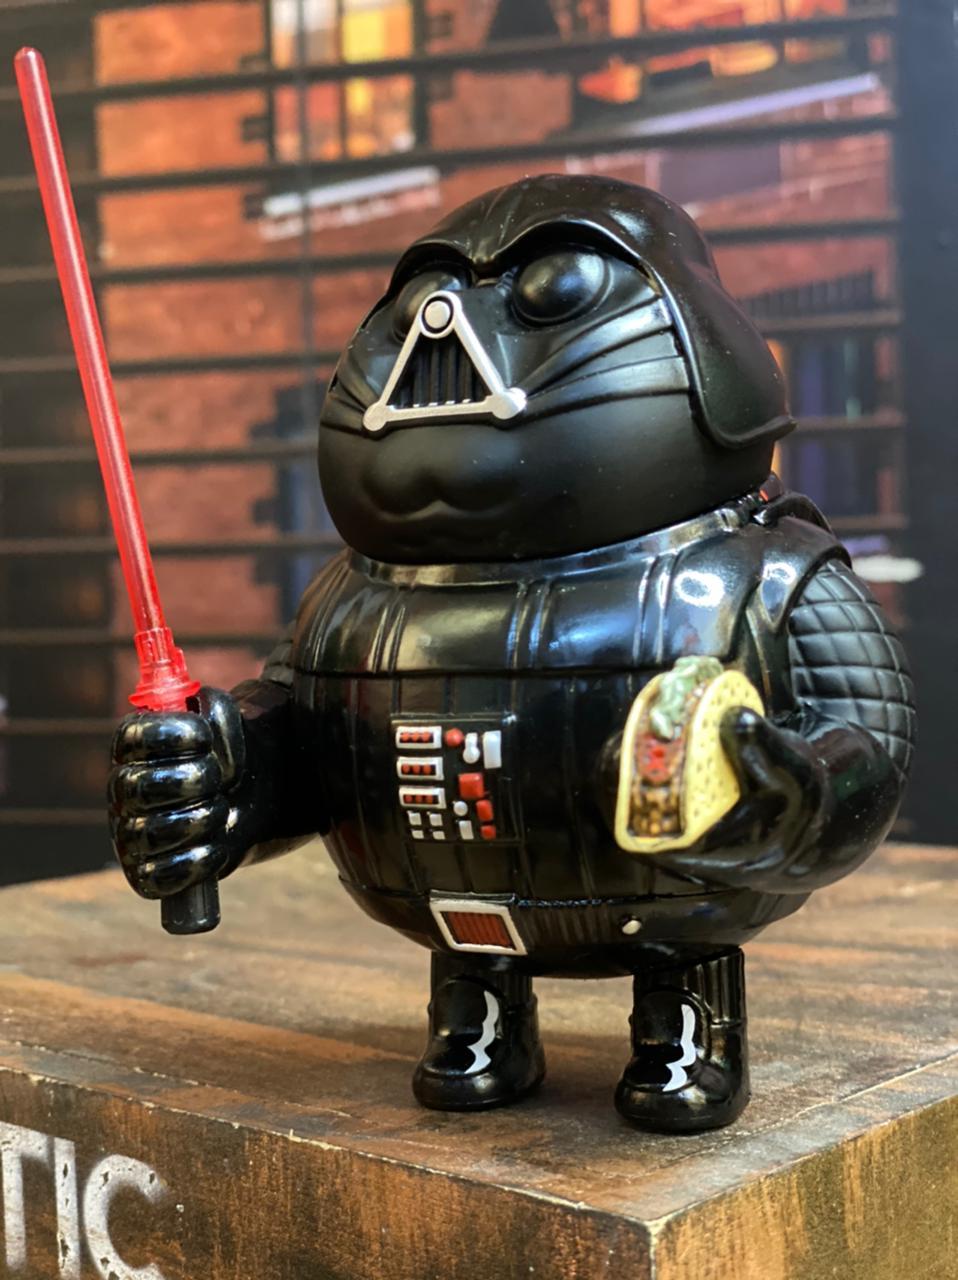 Estátua Darth Vader Gordo Fat Darth Vader: Star Wars #008 - Chubbiness - EVALI